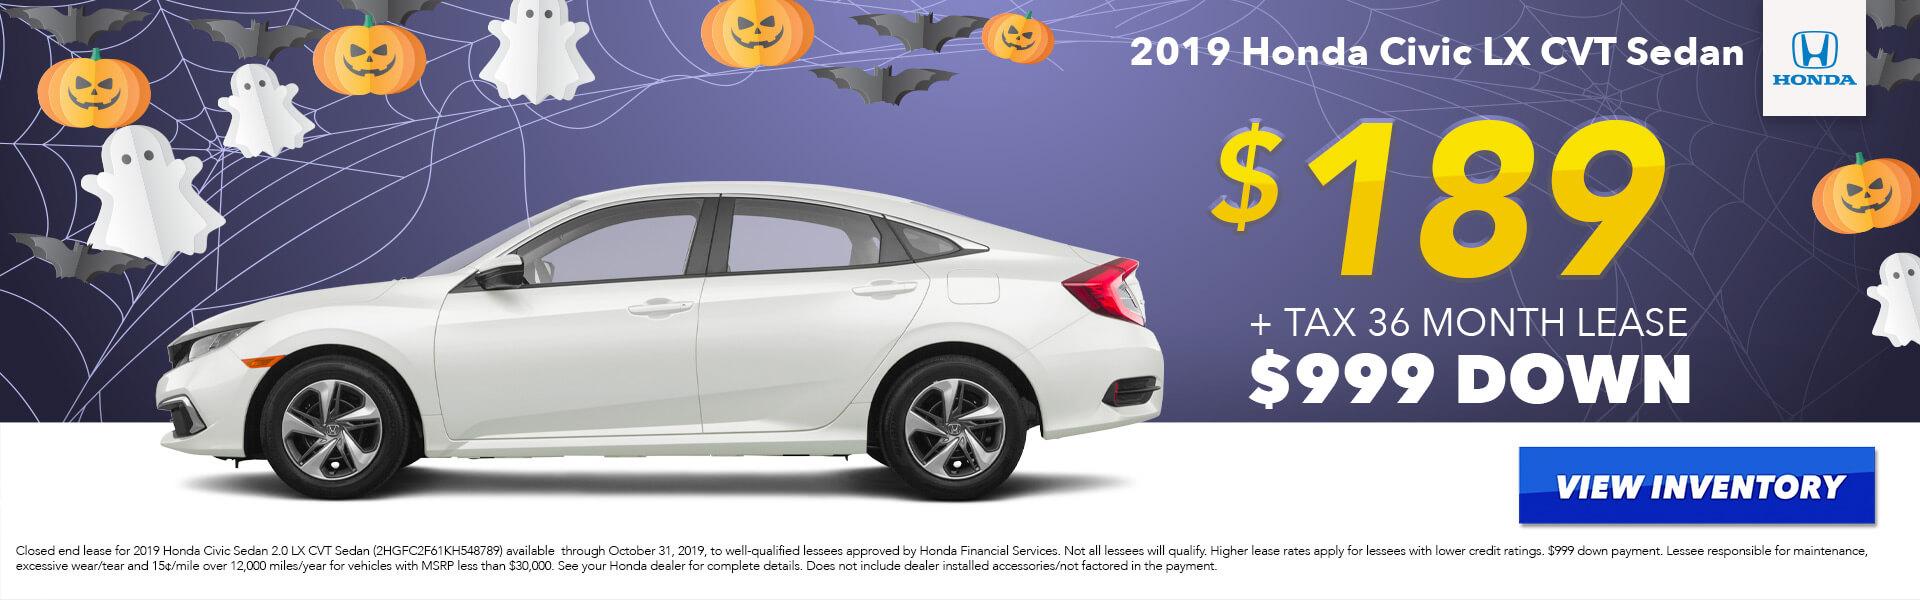 2019 Honda Civic LX Lease for $189